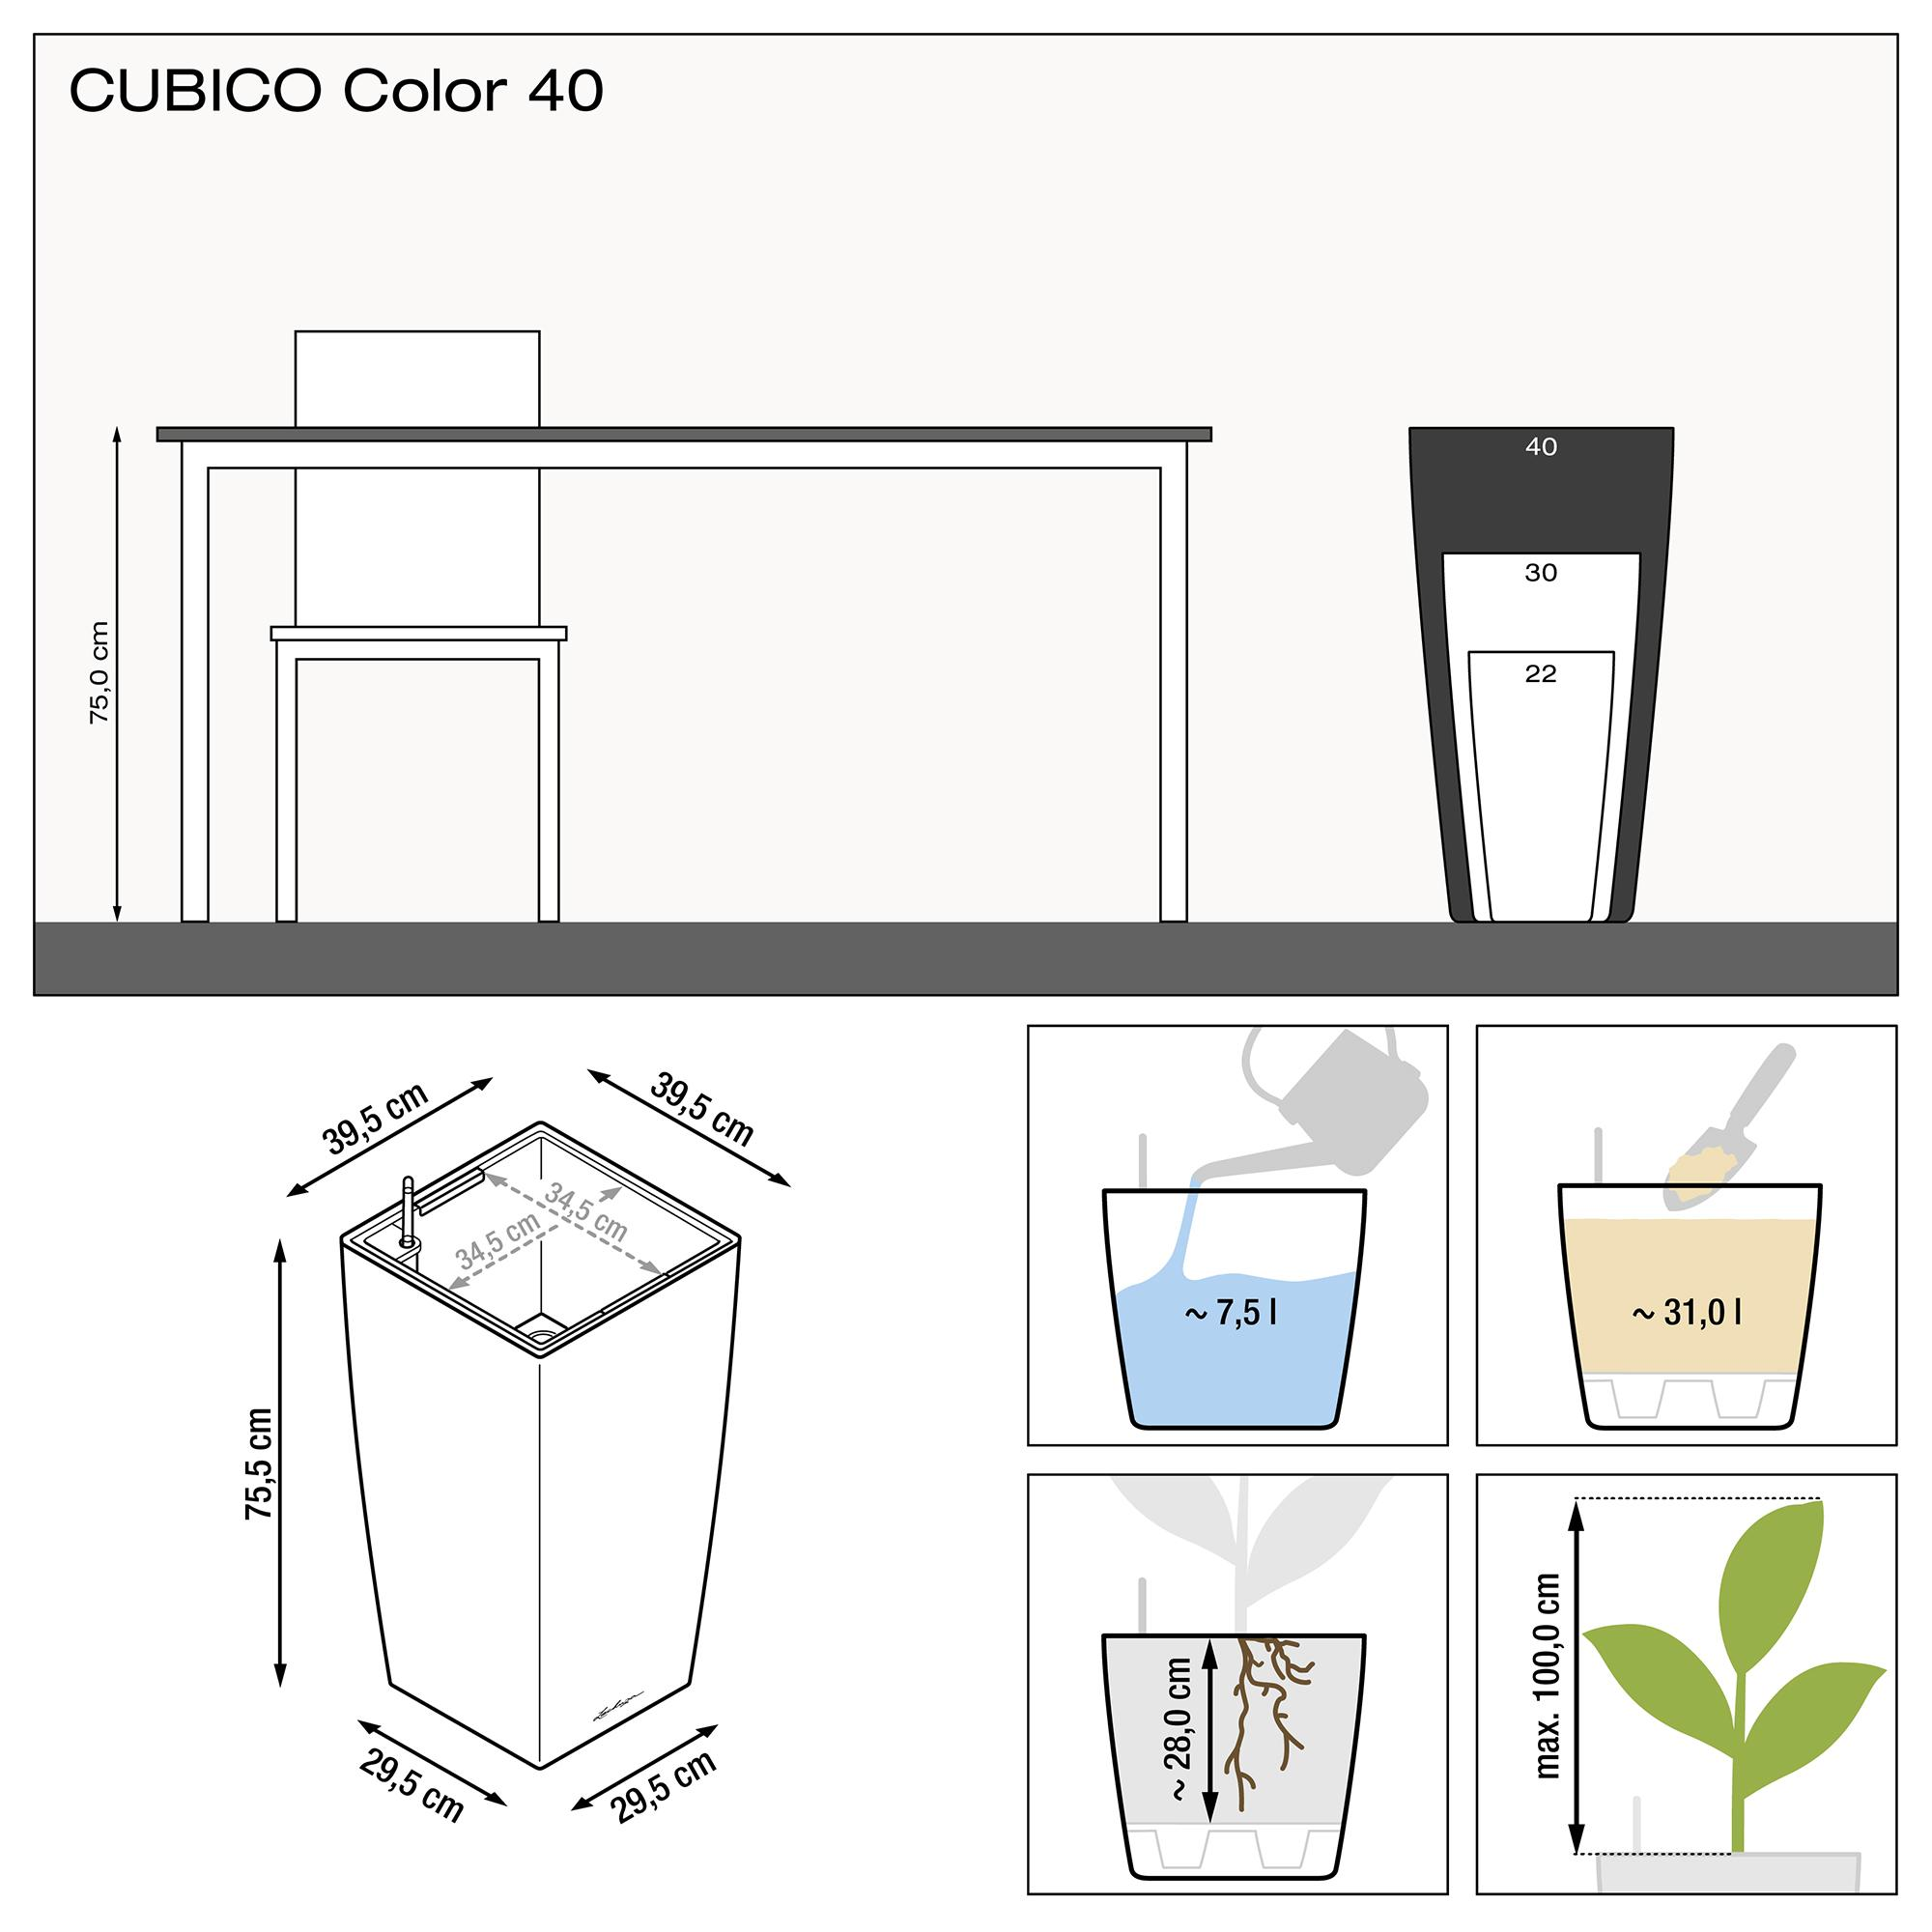 CUBICO Color 40 white - Image 3